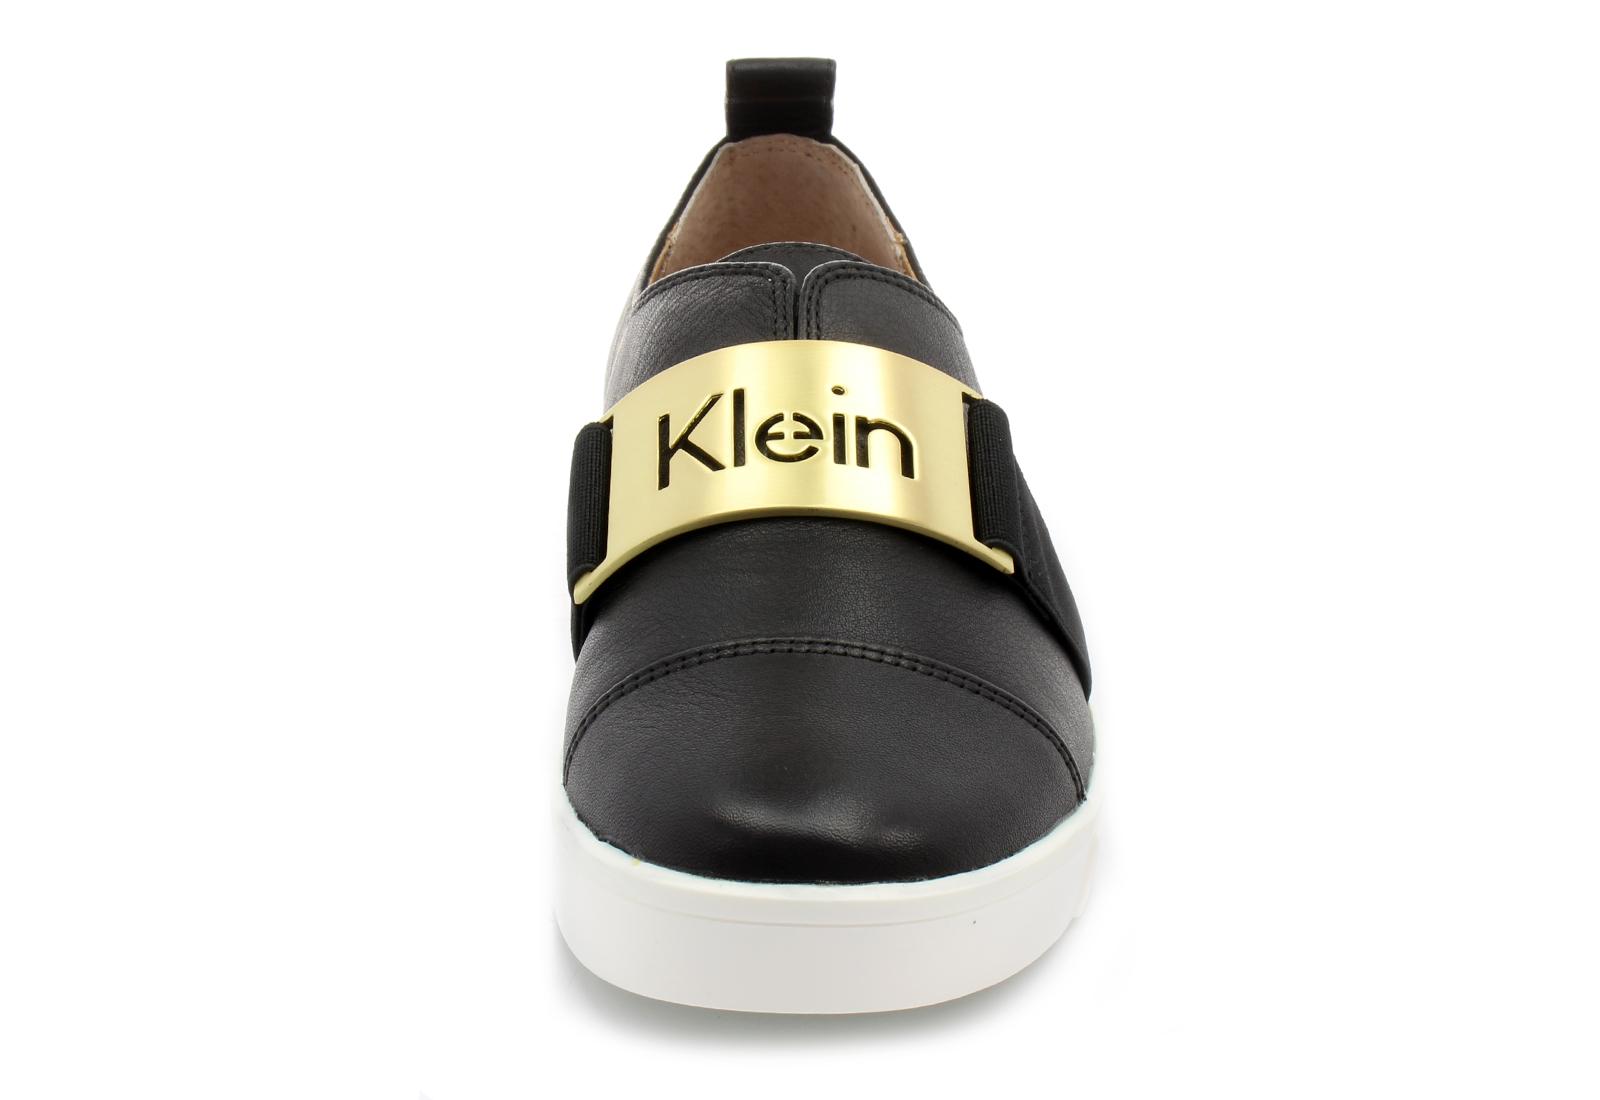 Calvin Klein Black Label Topánky - Ilona - E5681-BLK - Tenisky ... c6f5f7a8f93